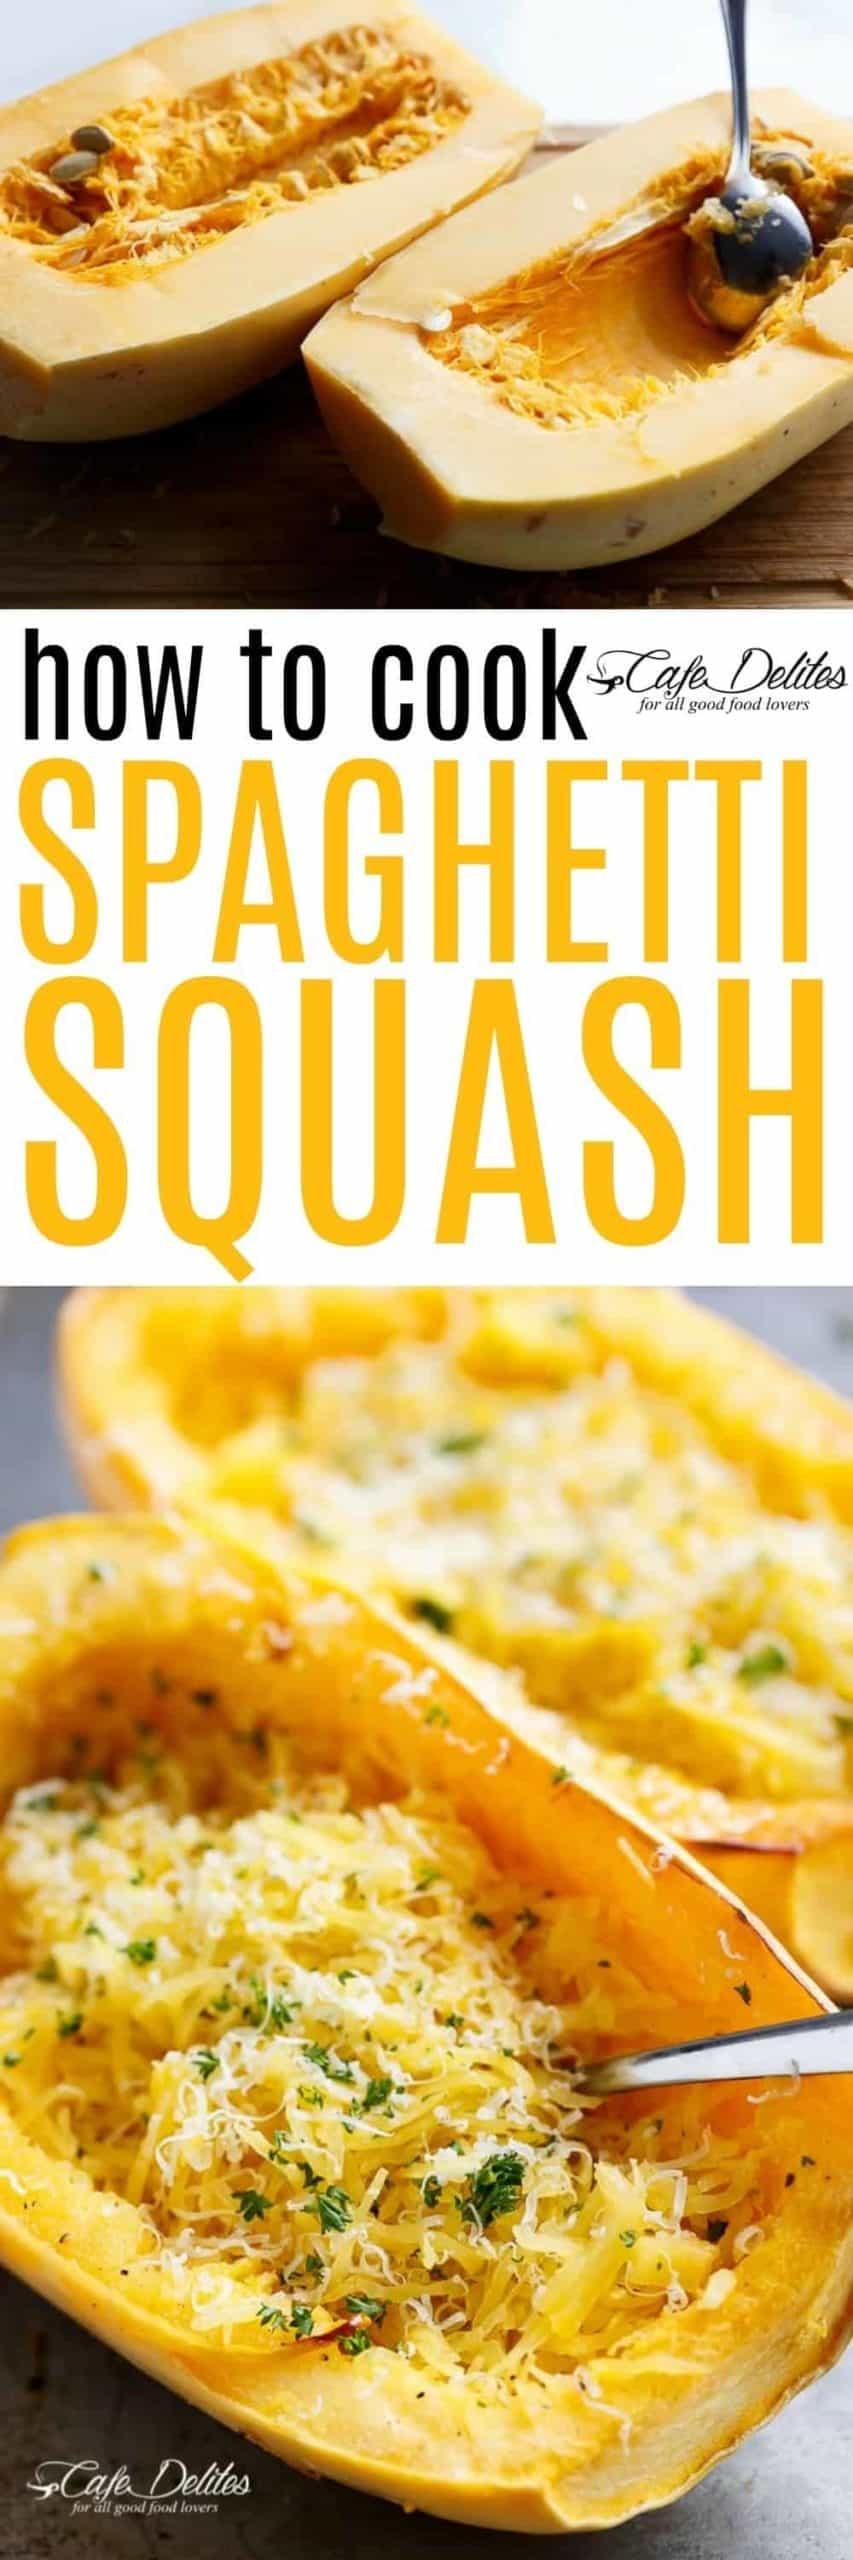 How To Cook Spaghetti Squash   https://cafedelites.com